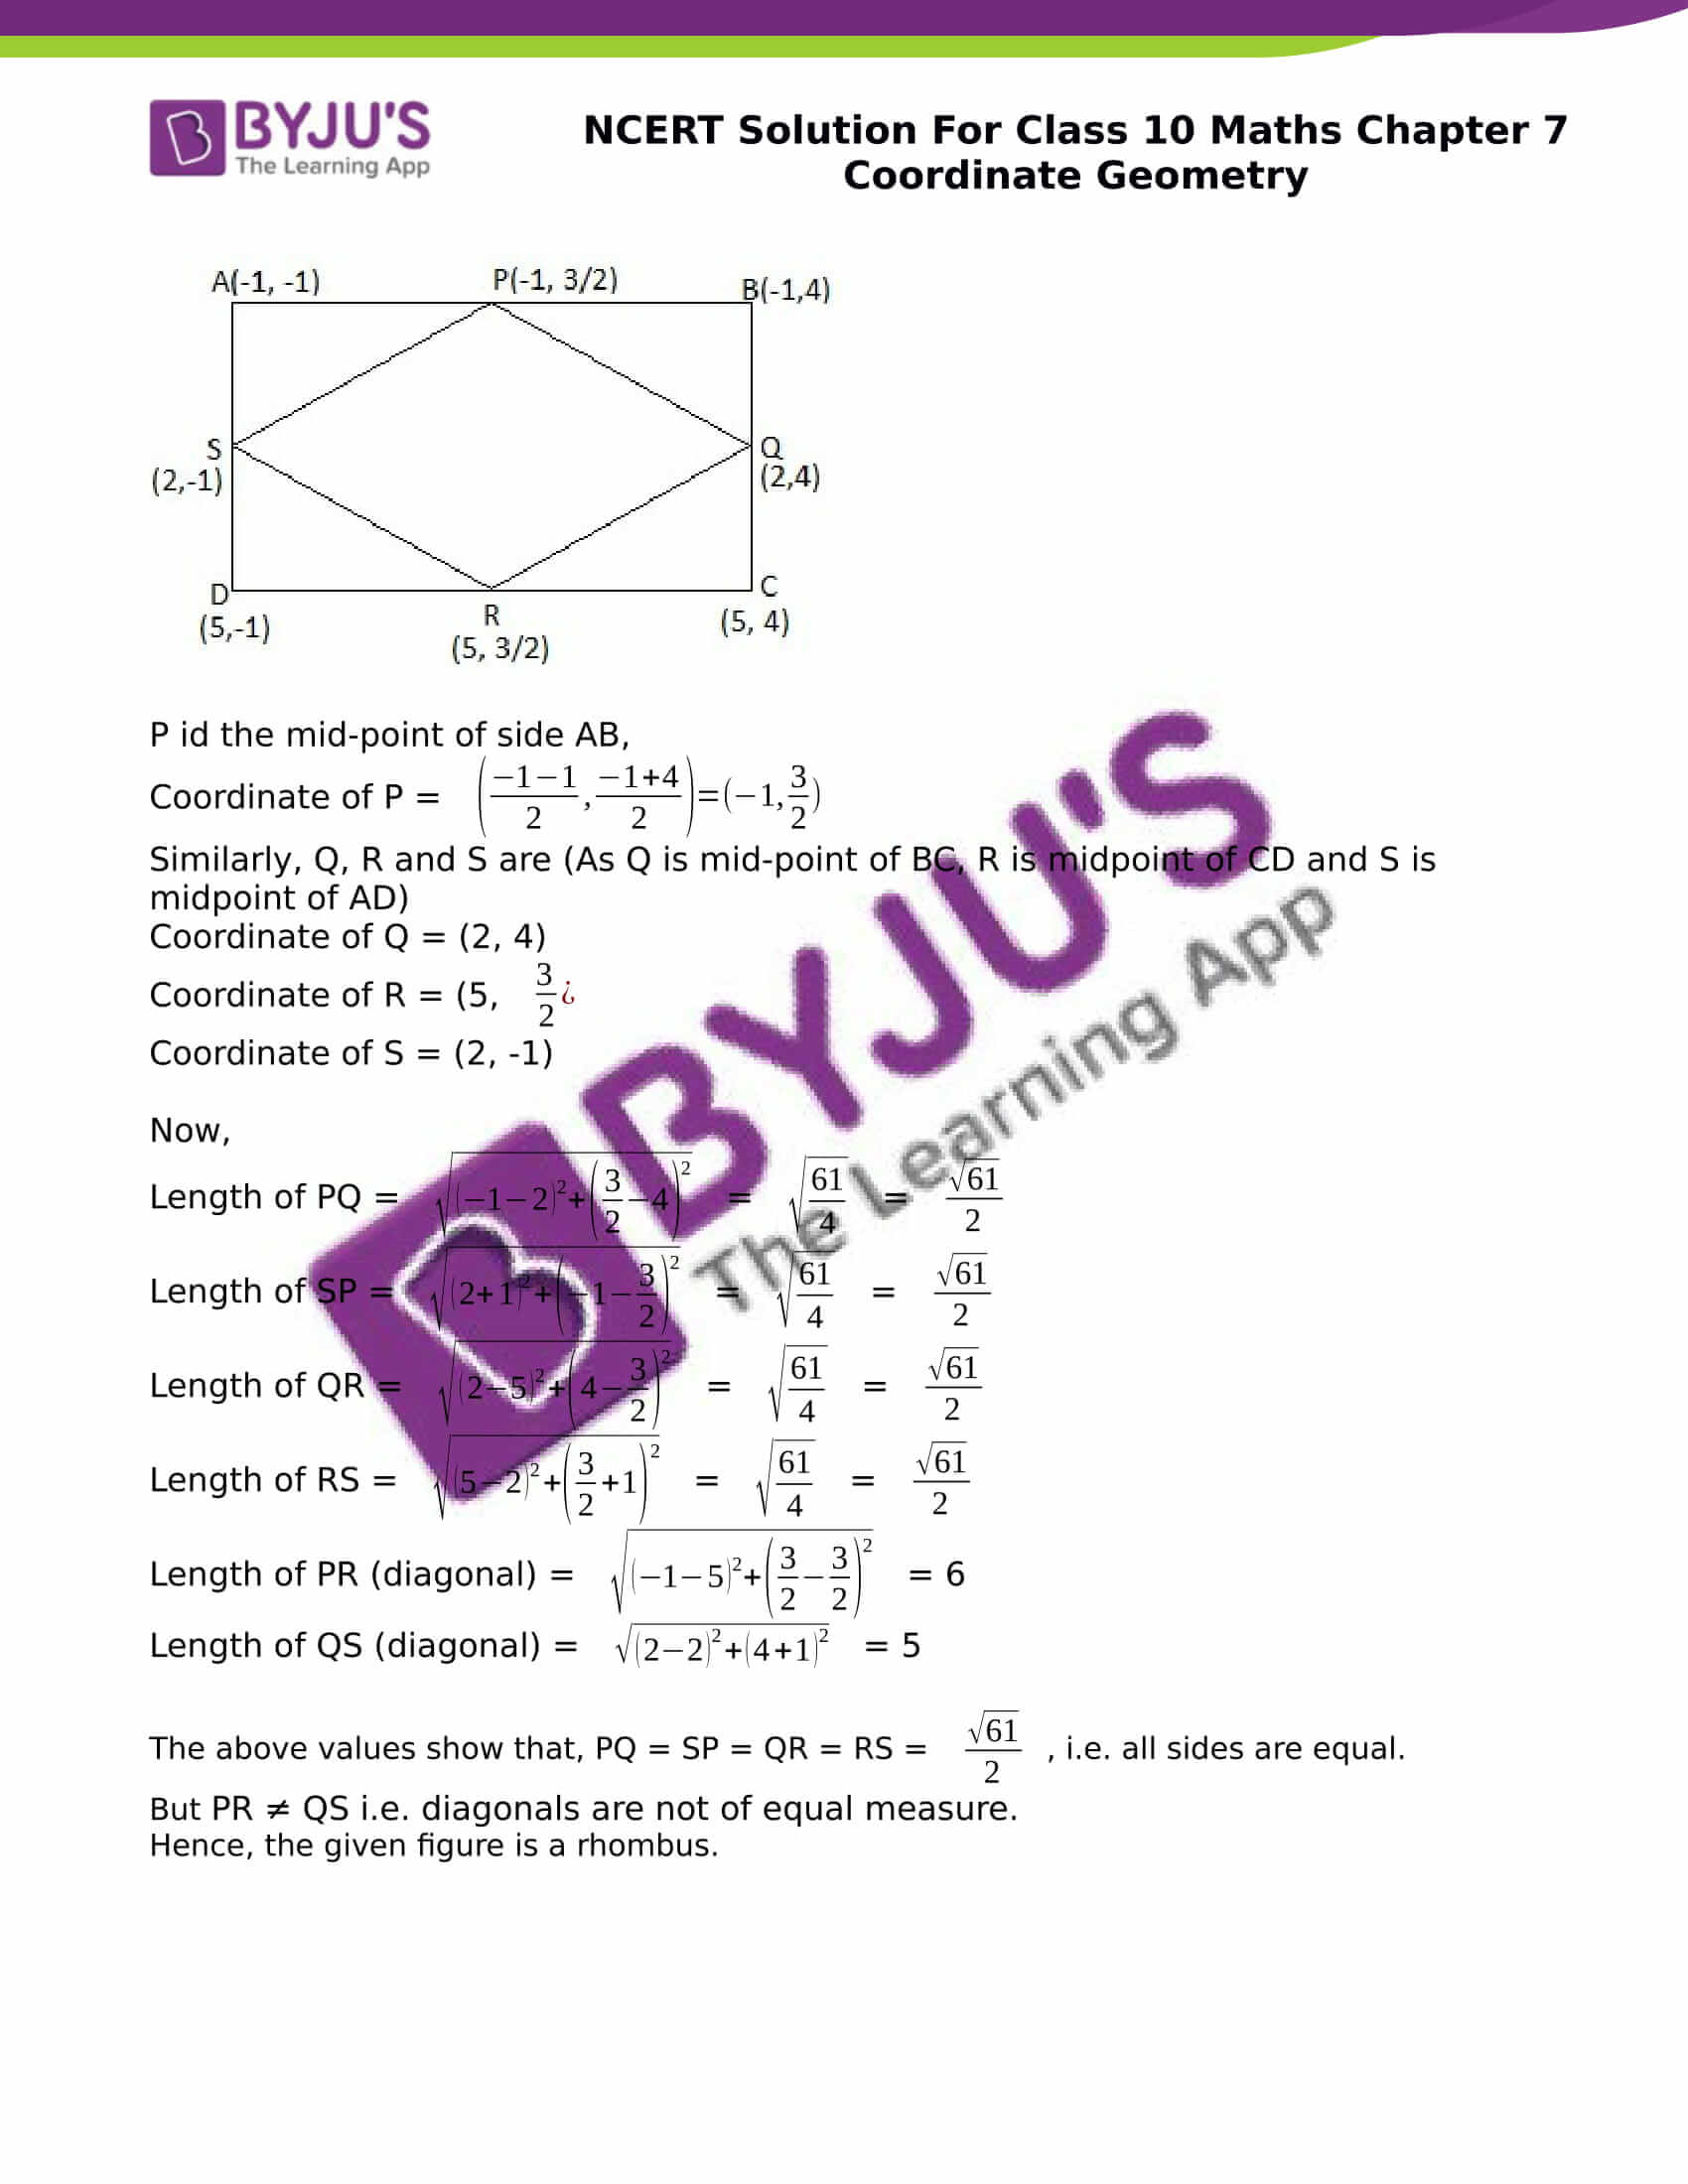 NCERT Solution for class 10 Maths chapter 7 Coordinate Geometry Part 31